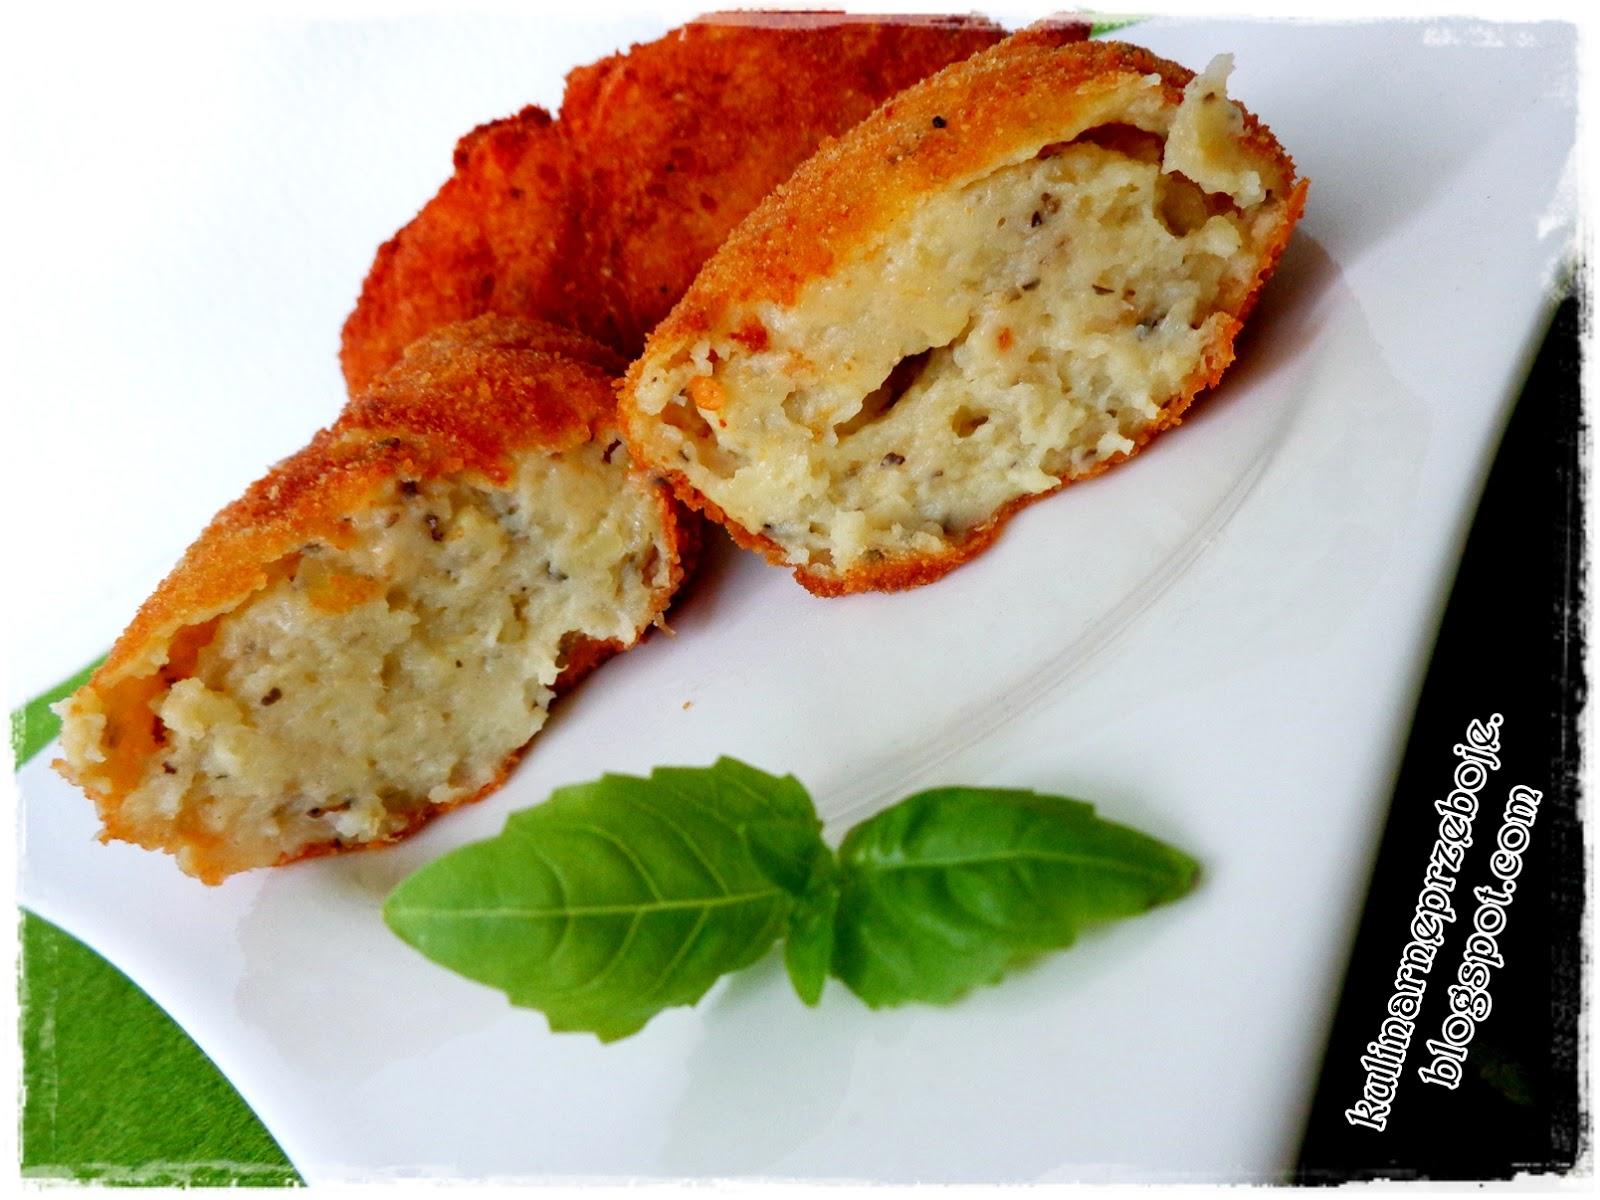 Krokiety ziemniaczane z bazylią i oregano / Kartoffelkroketten mit Basilikum und Oregano